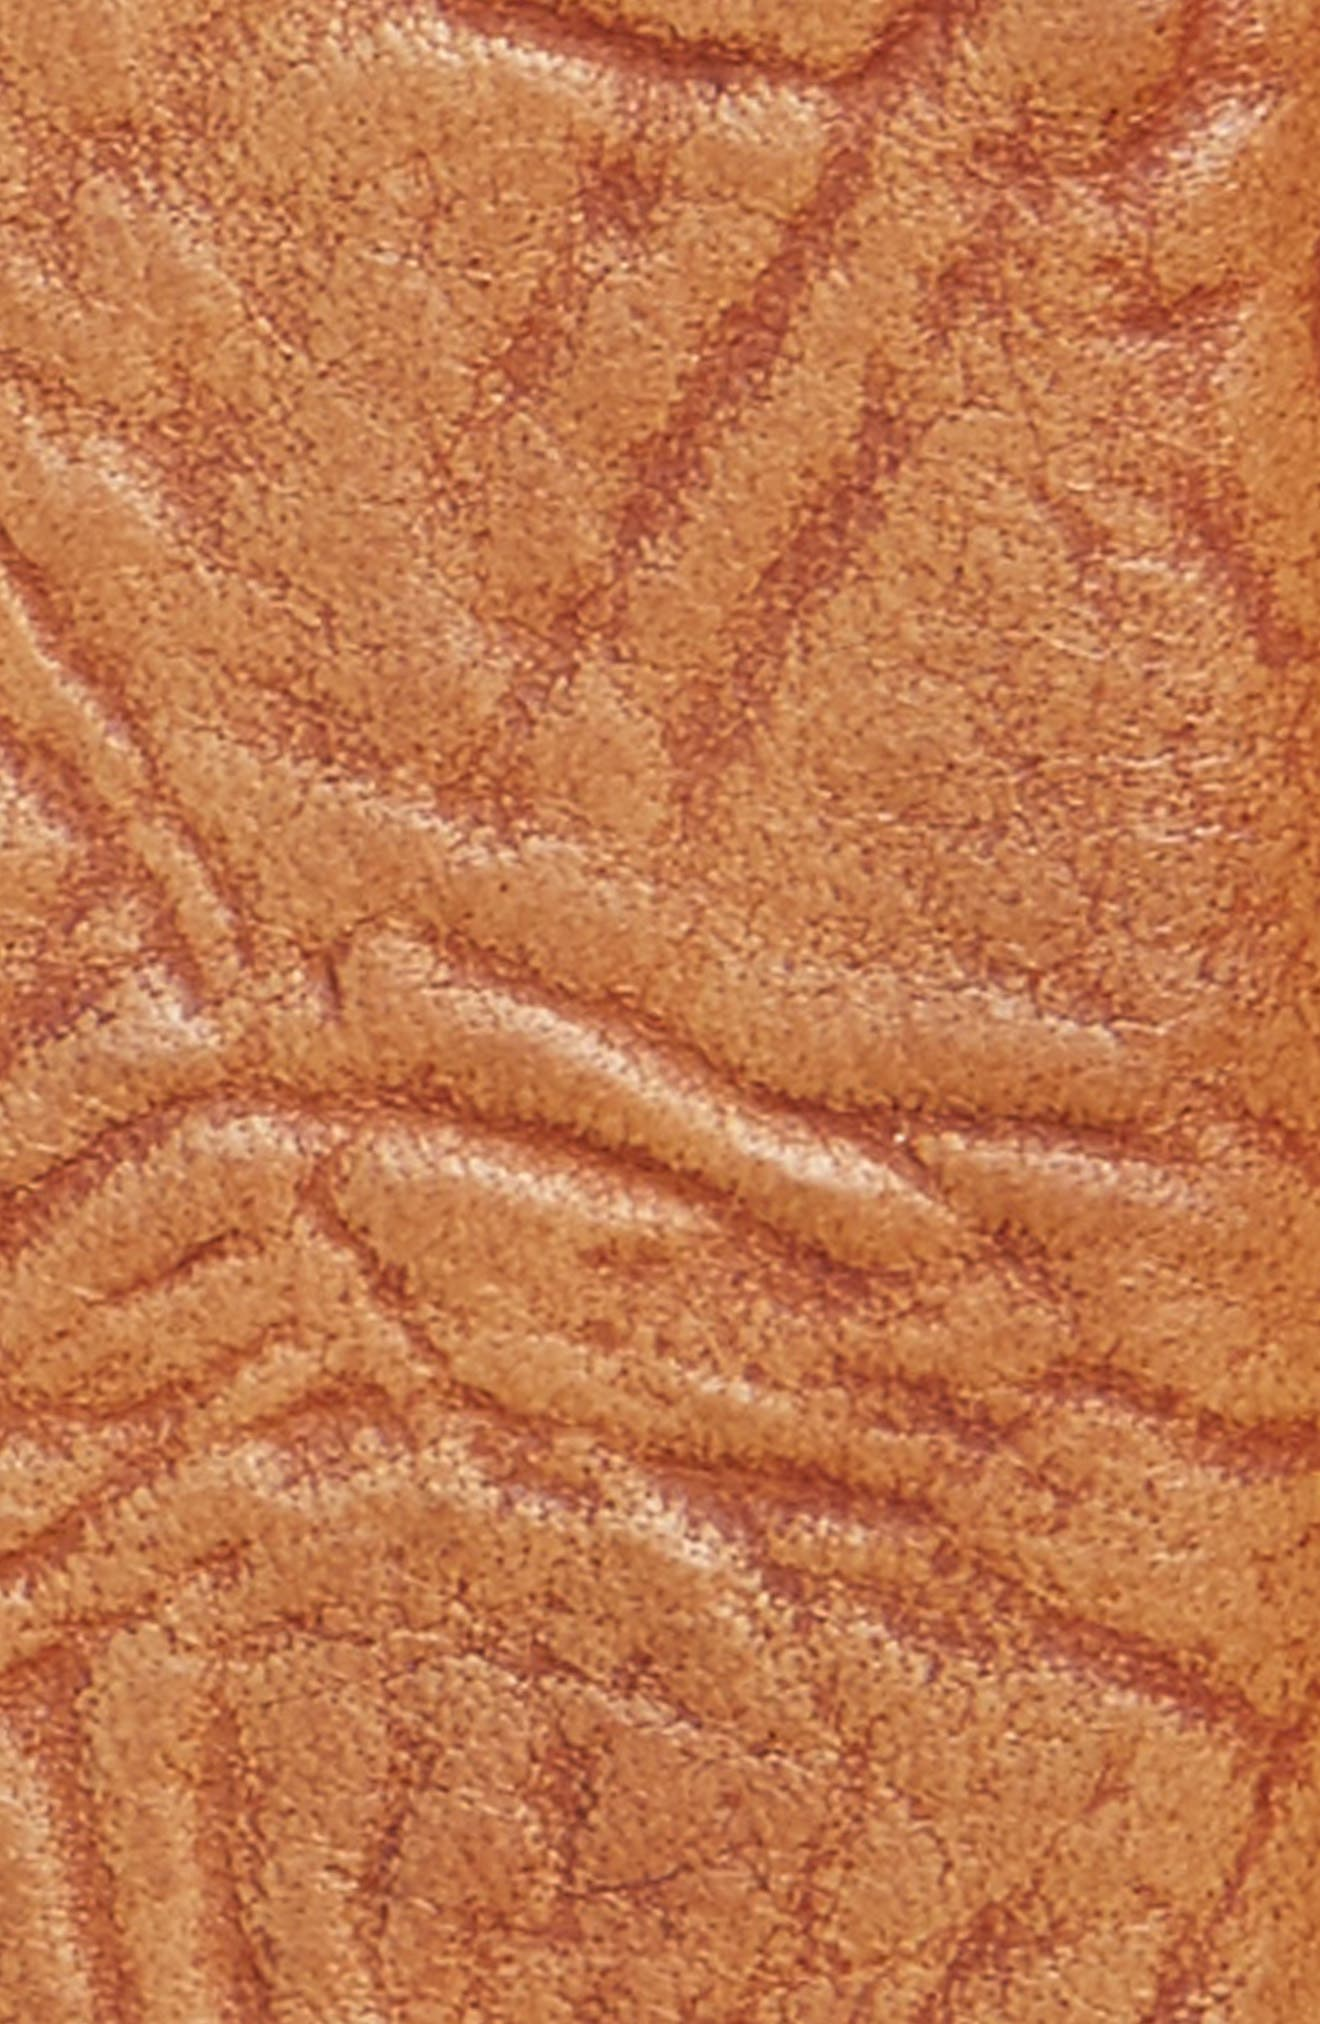 Puckered Leather Belt,                             Alternate thumbnail 2, color,                             SADDLE